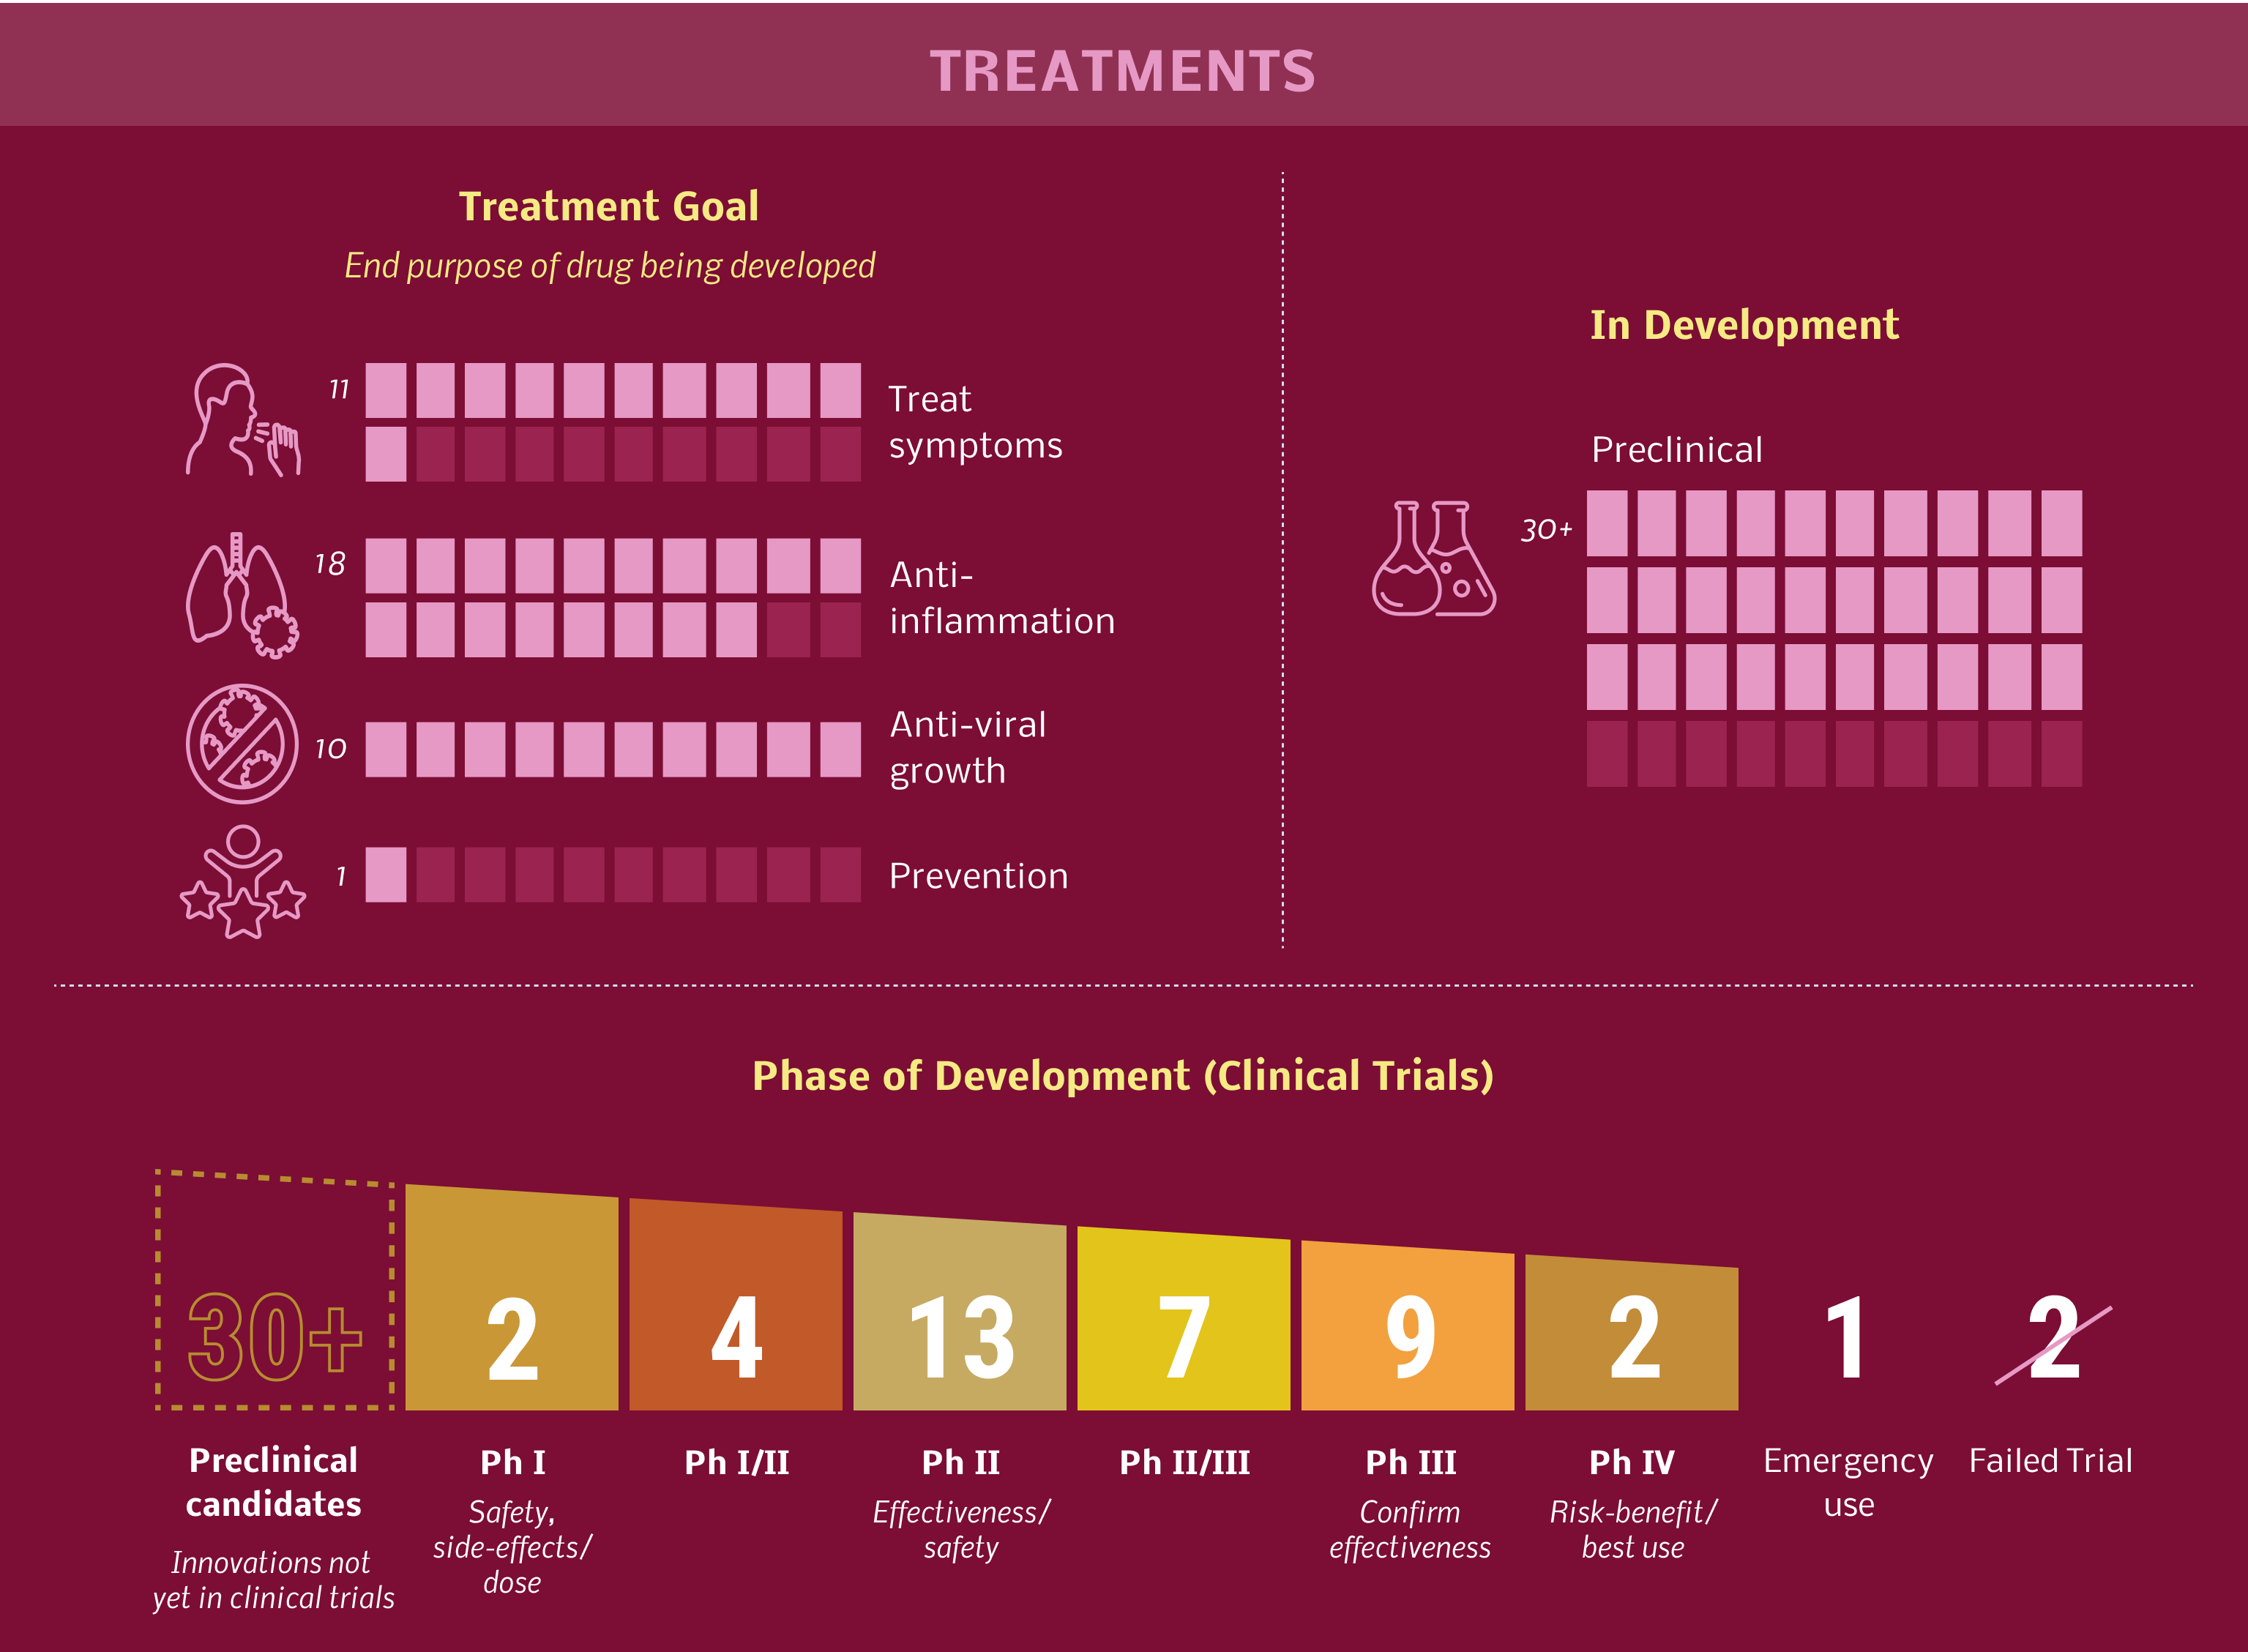 COVID-19 Treatment Updates